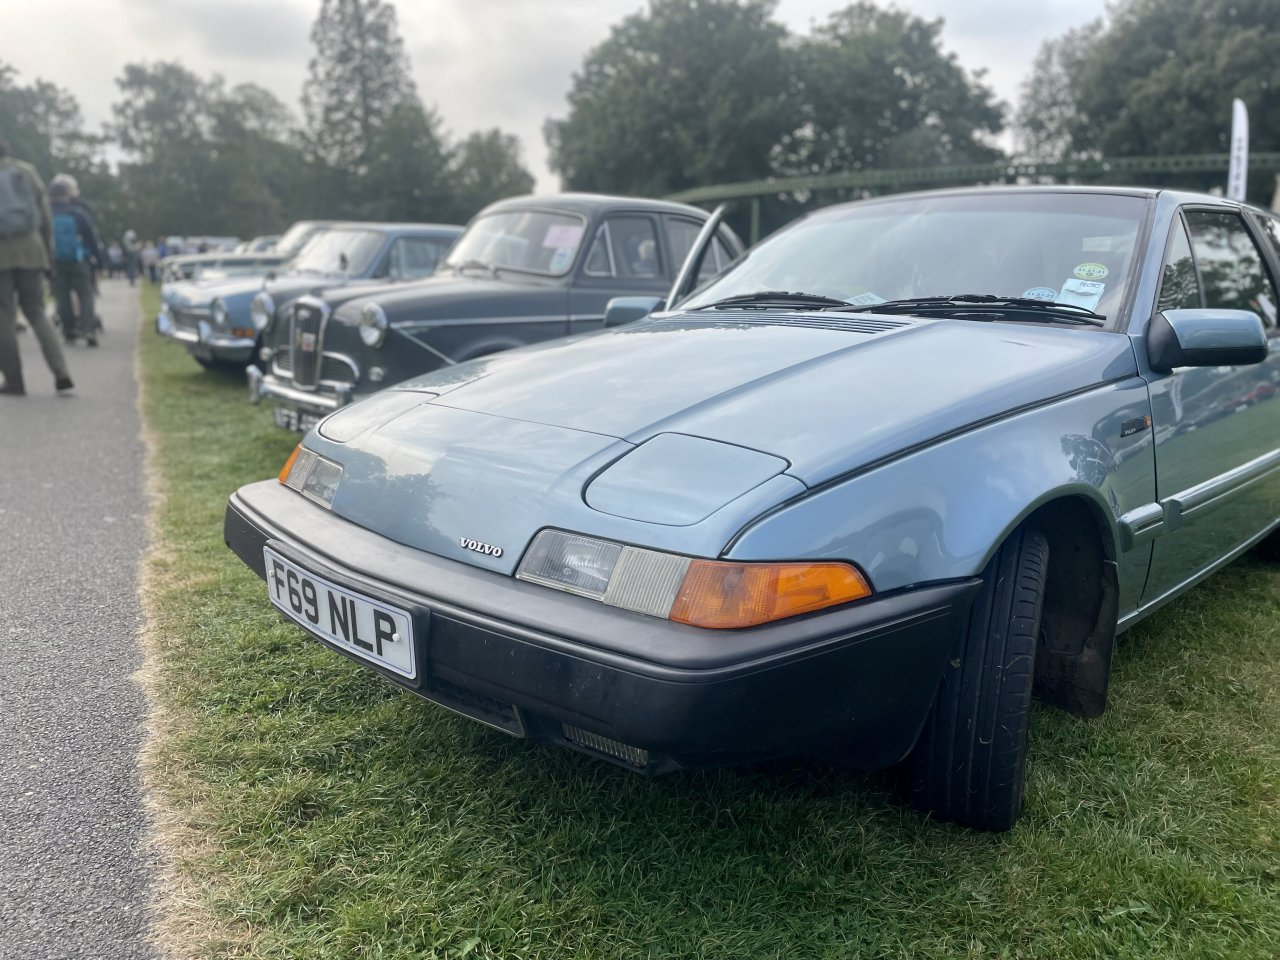 Autojumble, We have Hershey, the British have their Autojumble, ClassicCars.com Journal